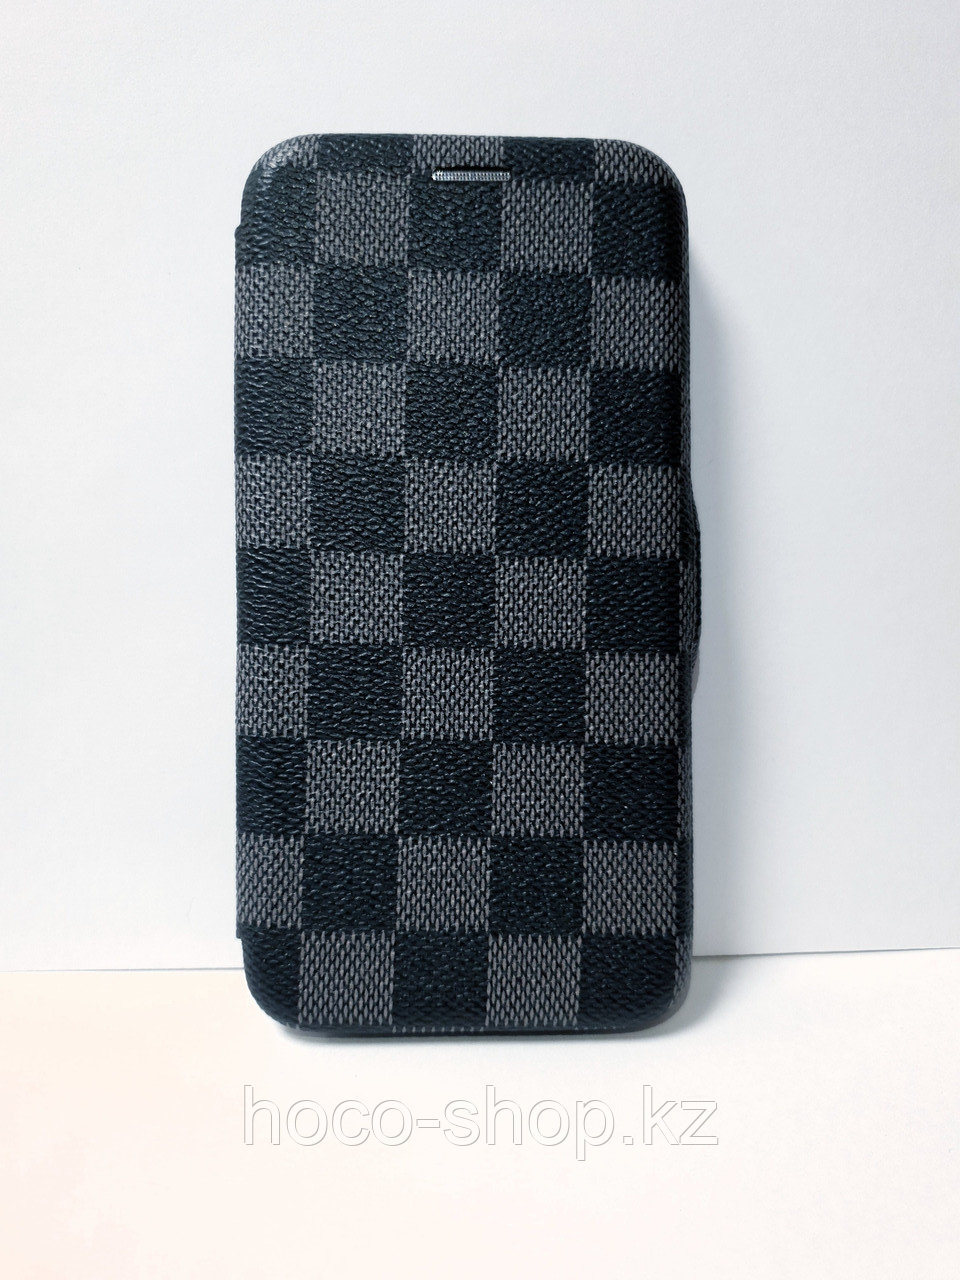 Кожаный чехол-книжка Louis Vuitton iPhone Xs Max - фото 1